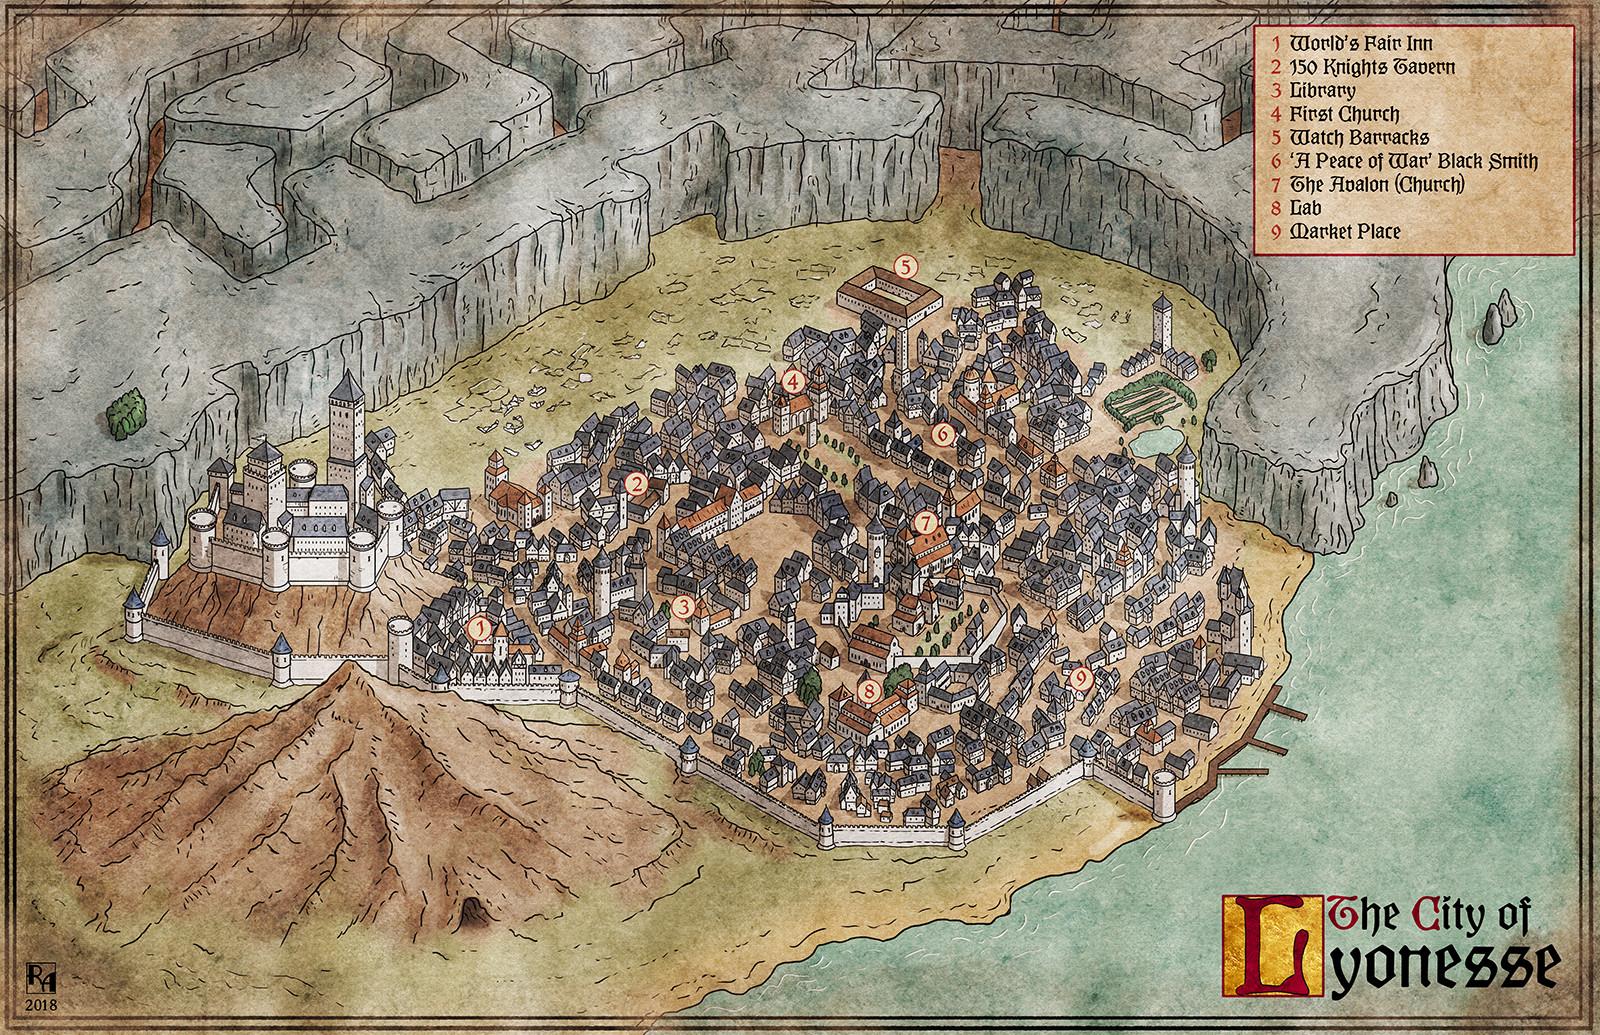 City of Lyonesse